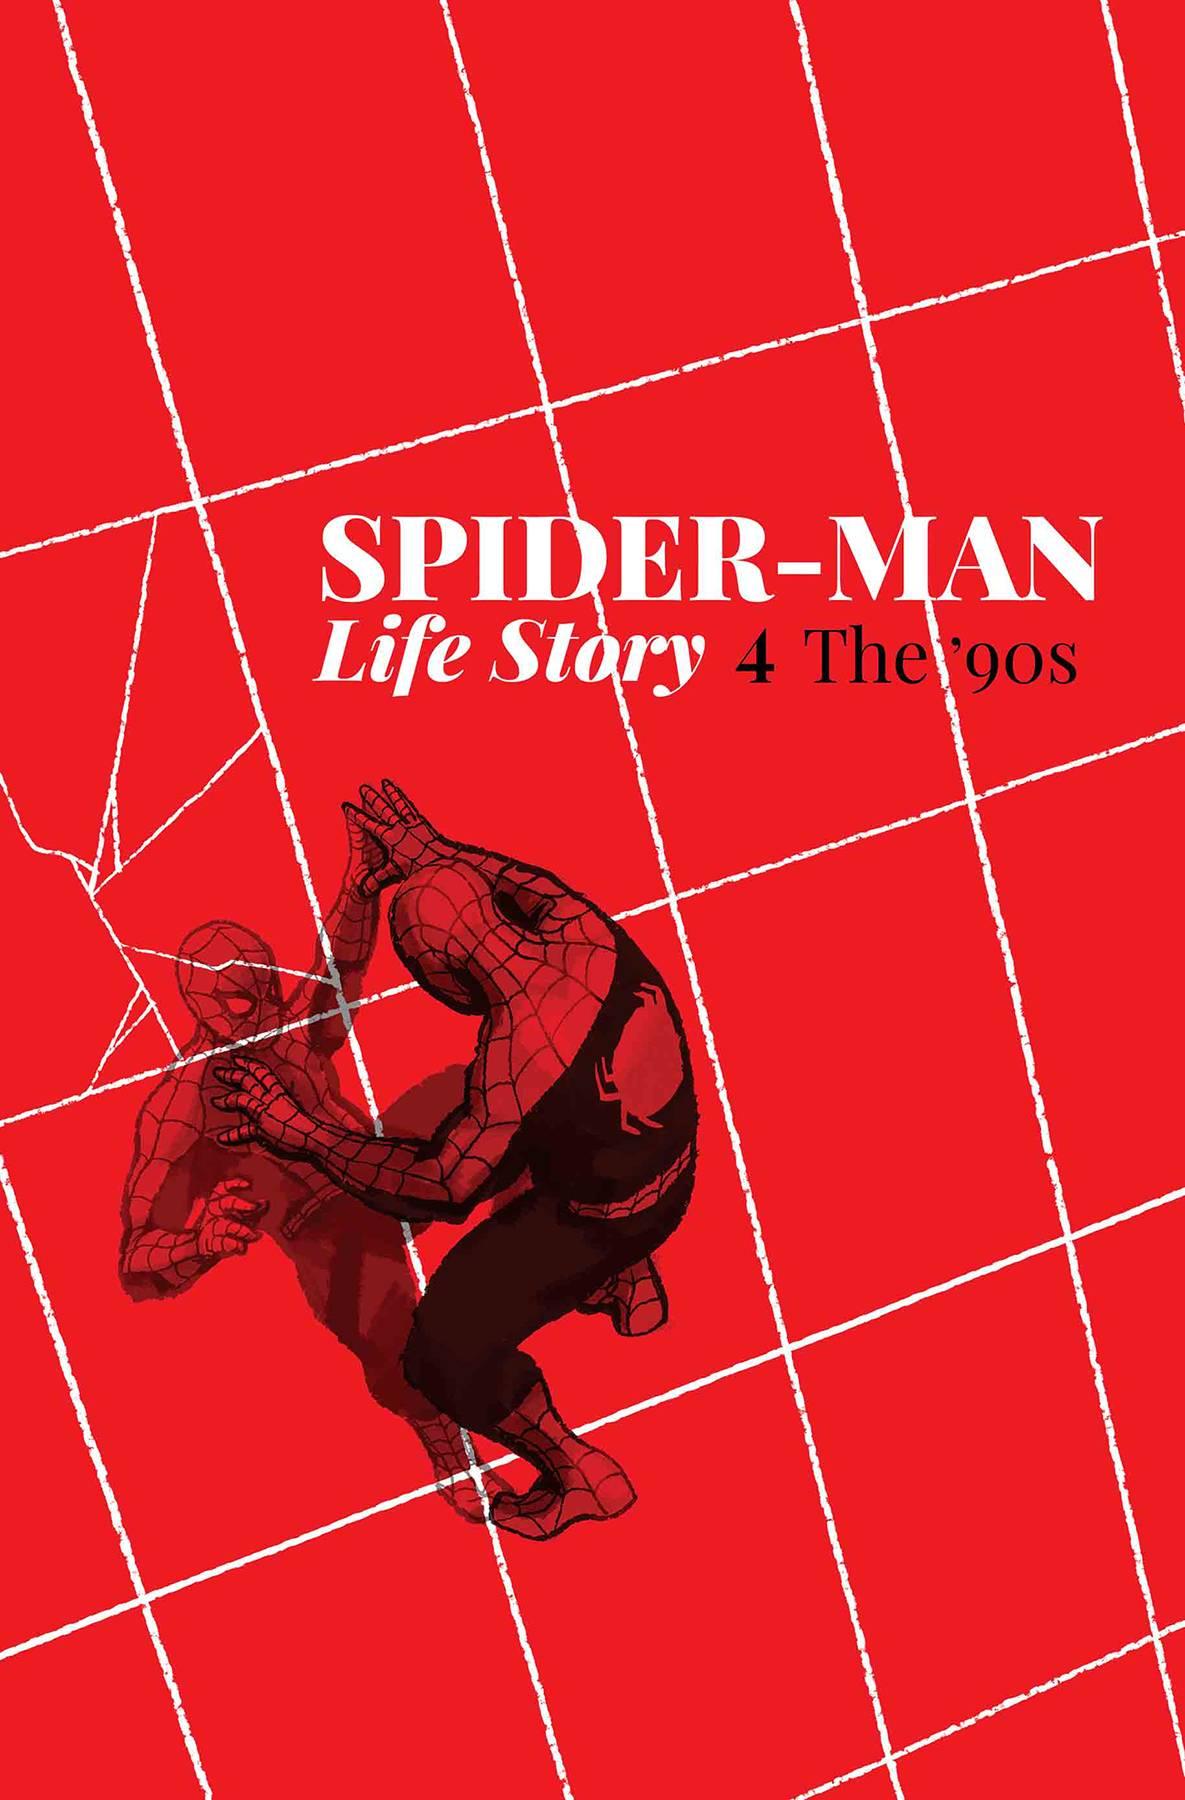 SPIDER-MAN LIFE STORY #4